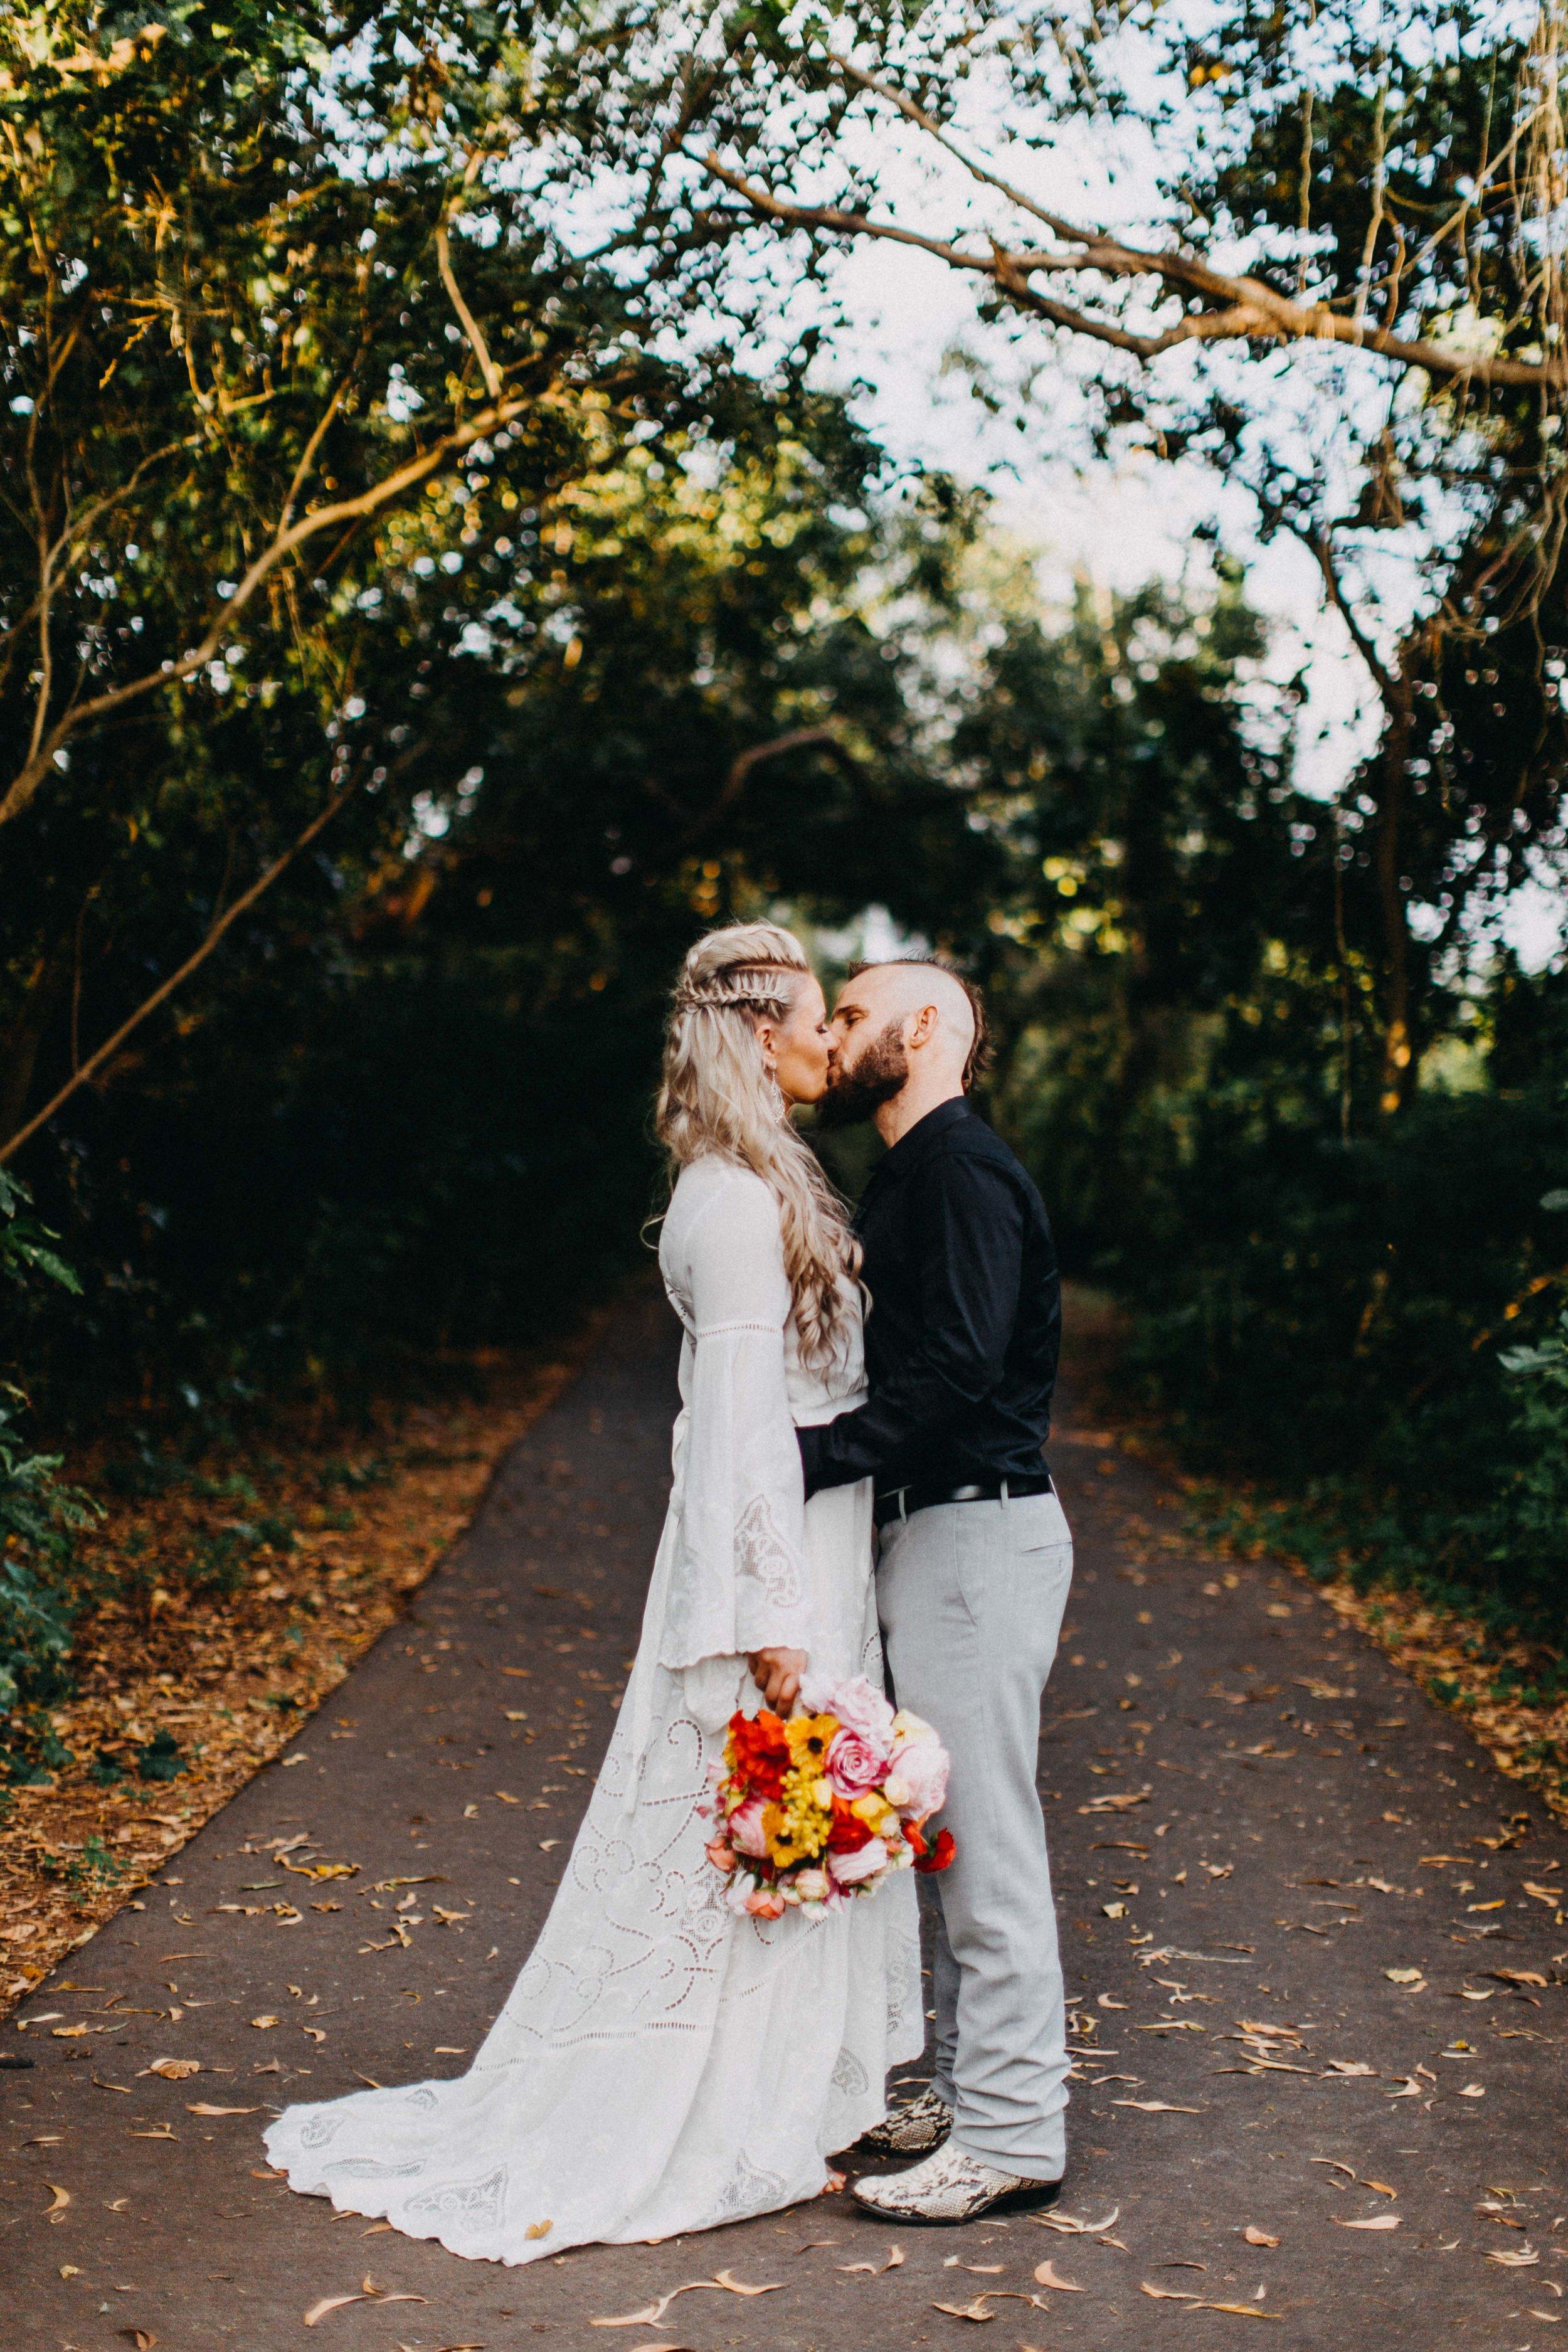 darwin-elopement-wedding-beach-camden-photography-www.emilyobrienphotography.net-56.jpg